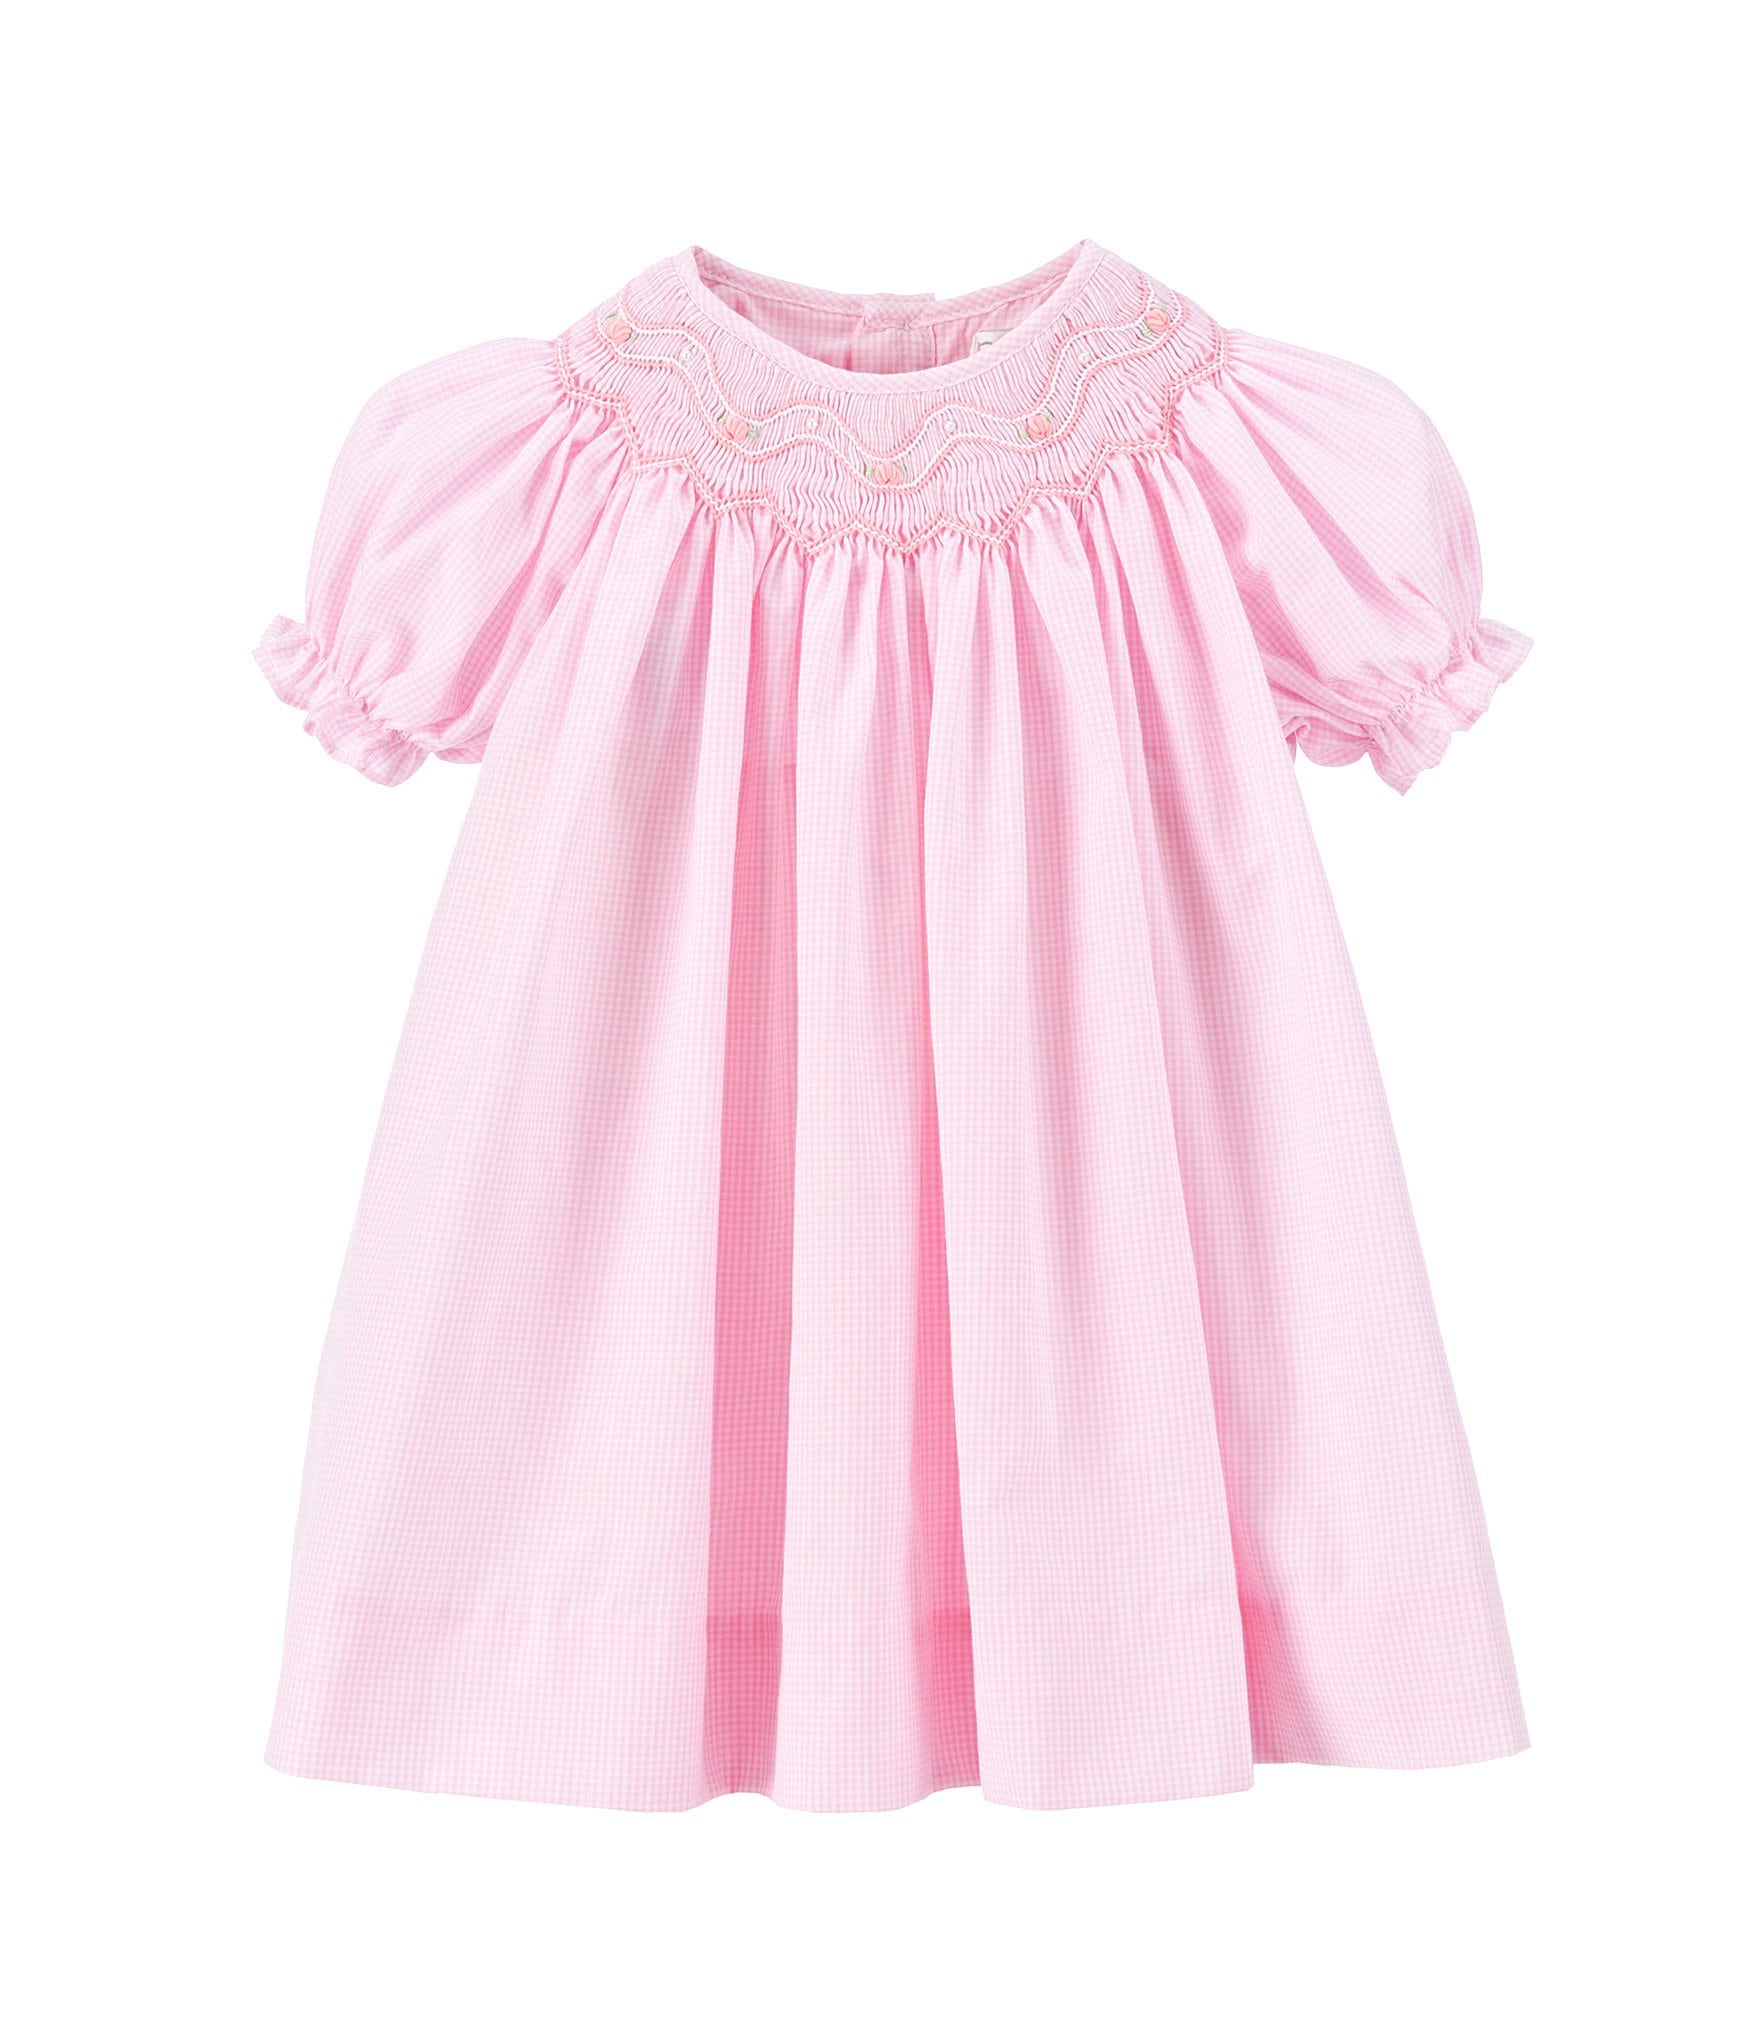 8b06f4eb4 Petit Ami Baby Girls 12-24 Months Smocked Gingham Dress